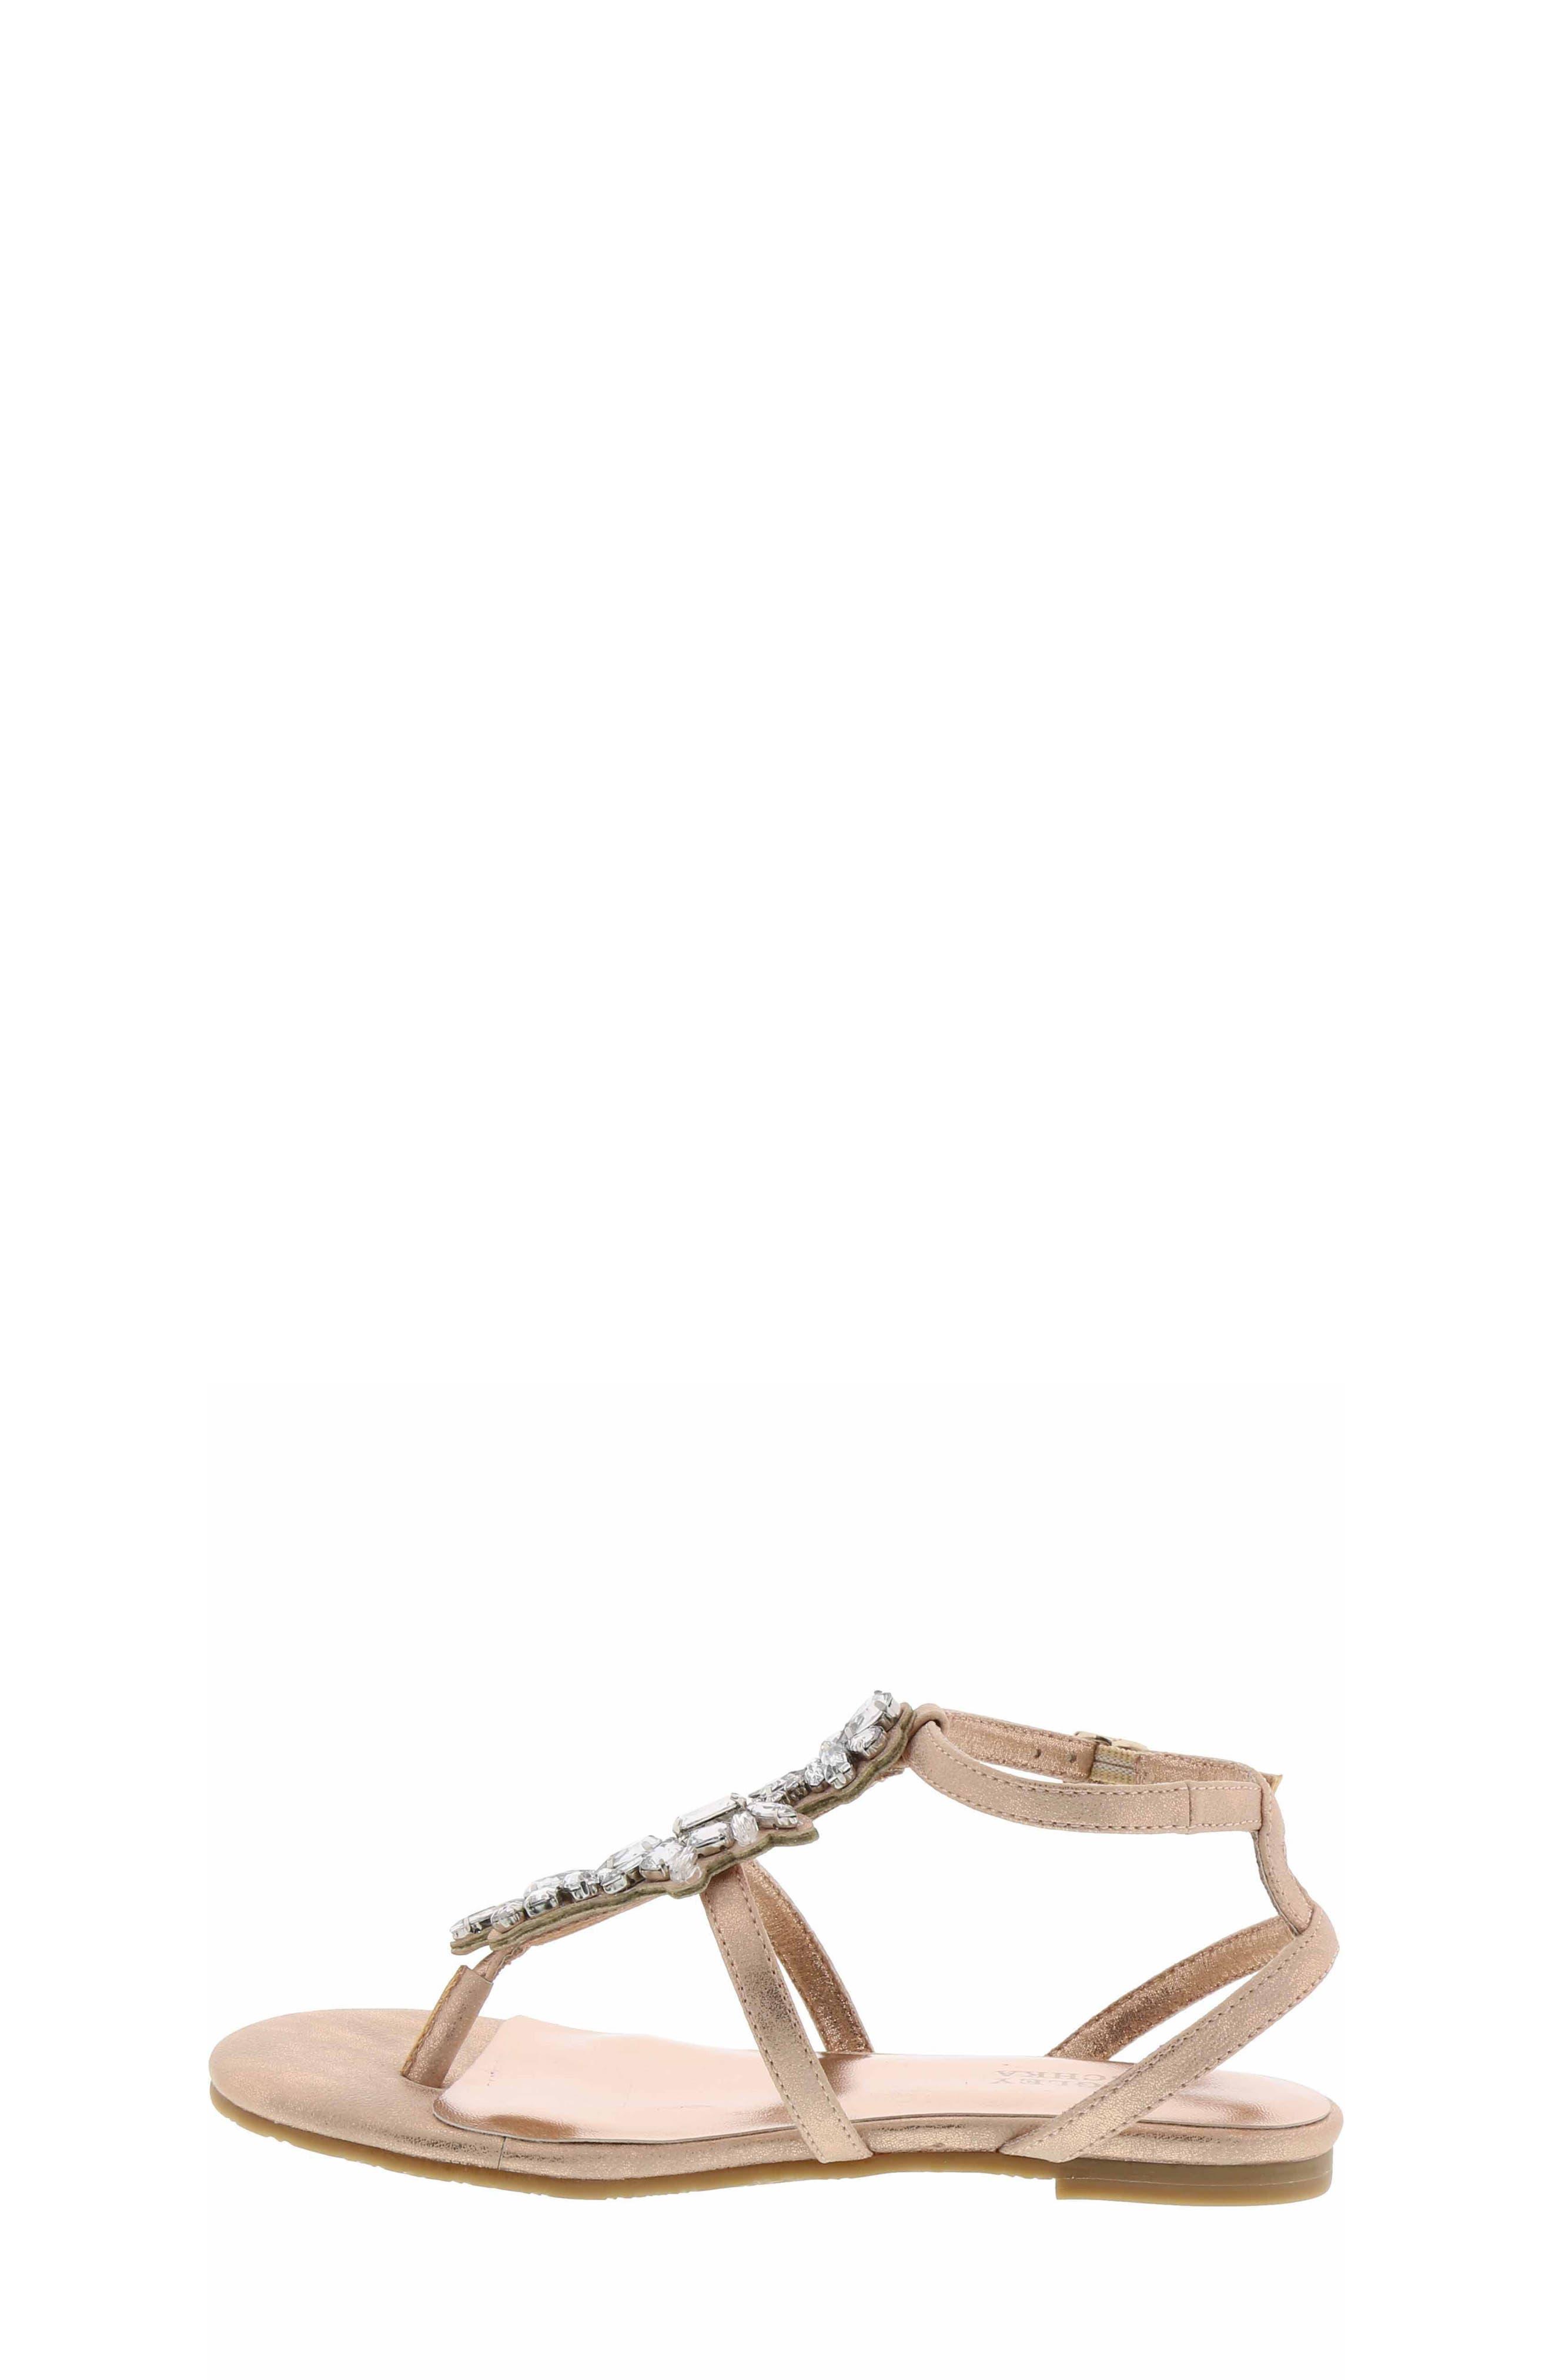 Cara Barstow Embellished Sandal,                             Alternate thumbnail 6, color,